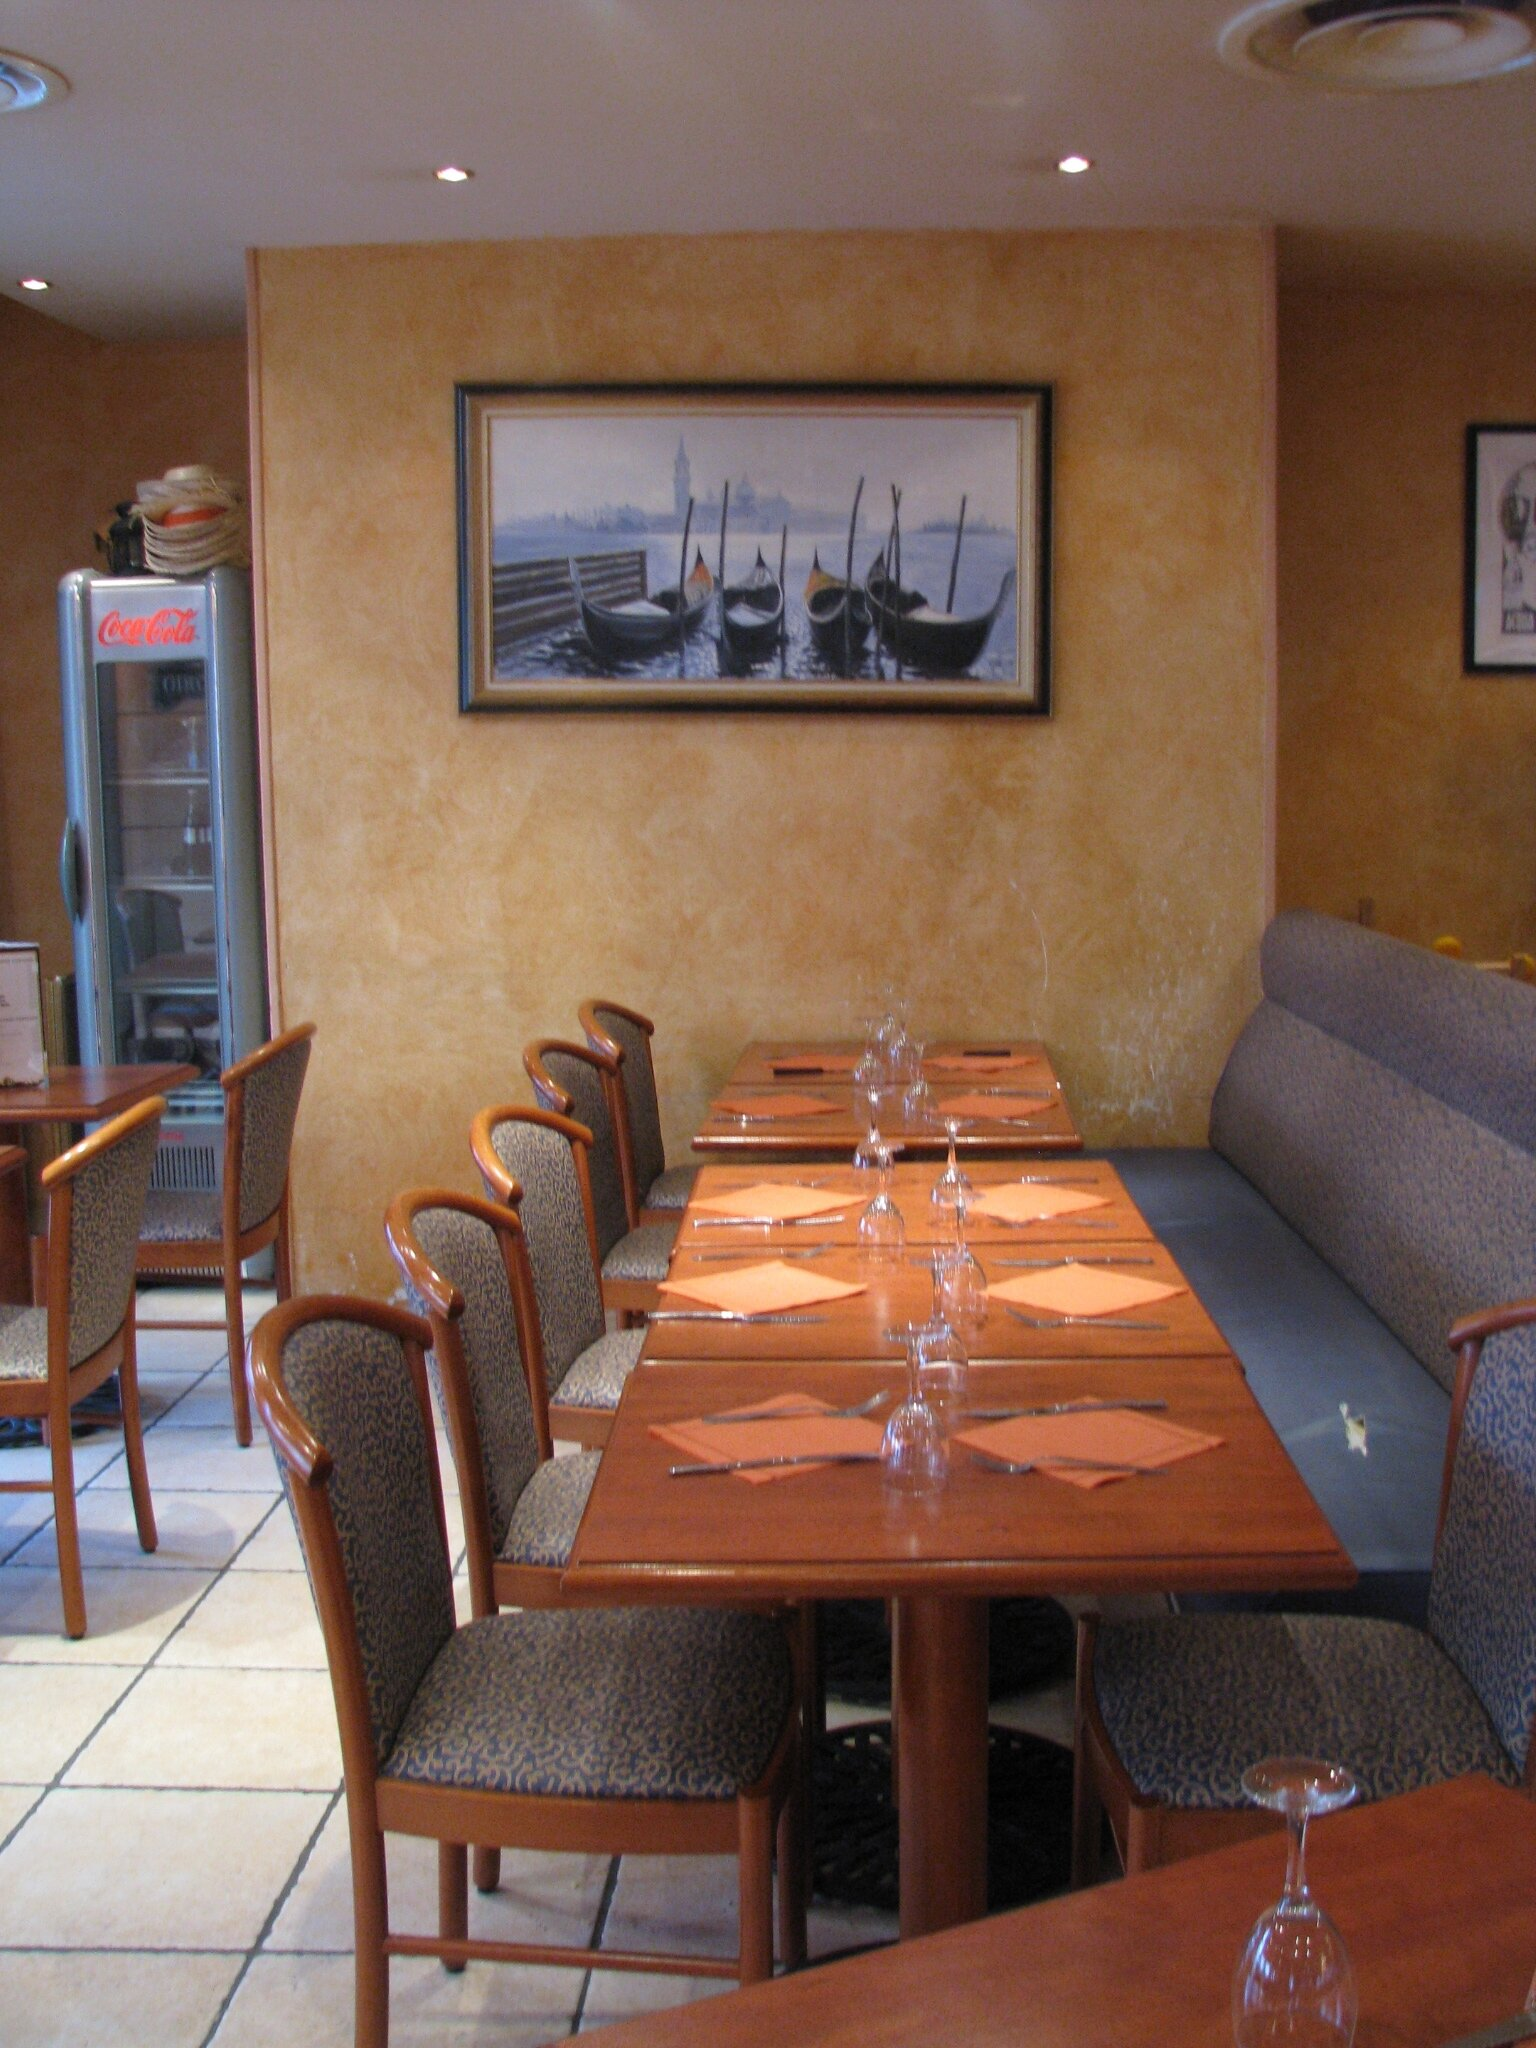 Le restaurant El palazzo avant travaux